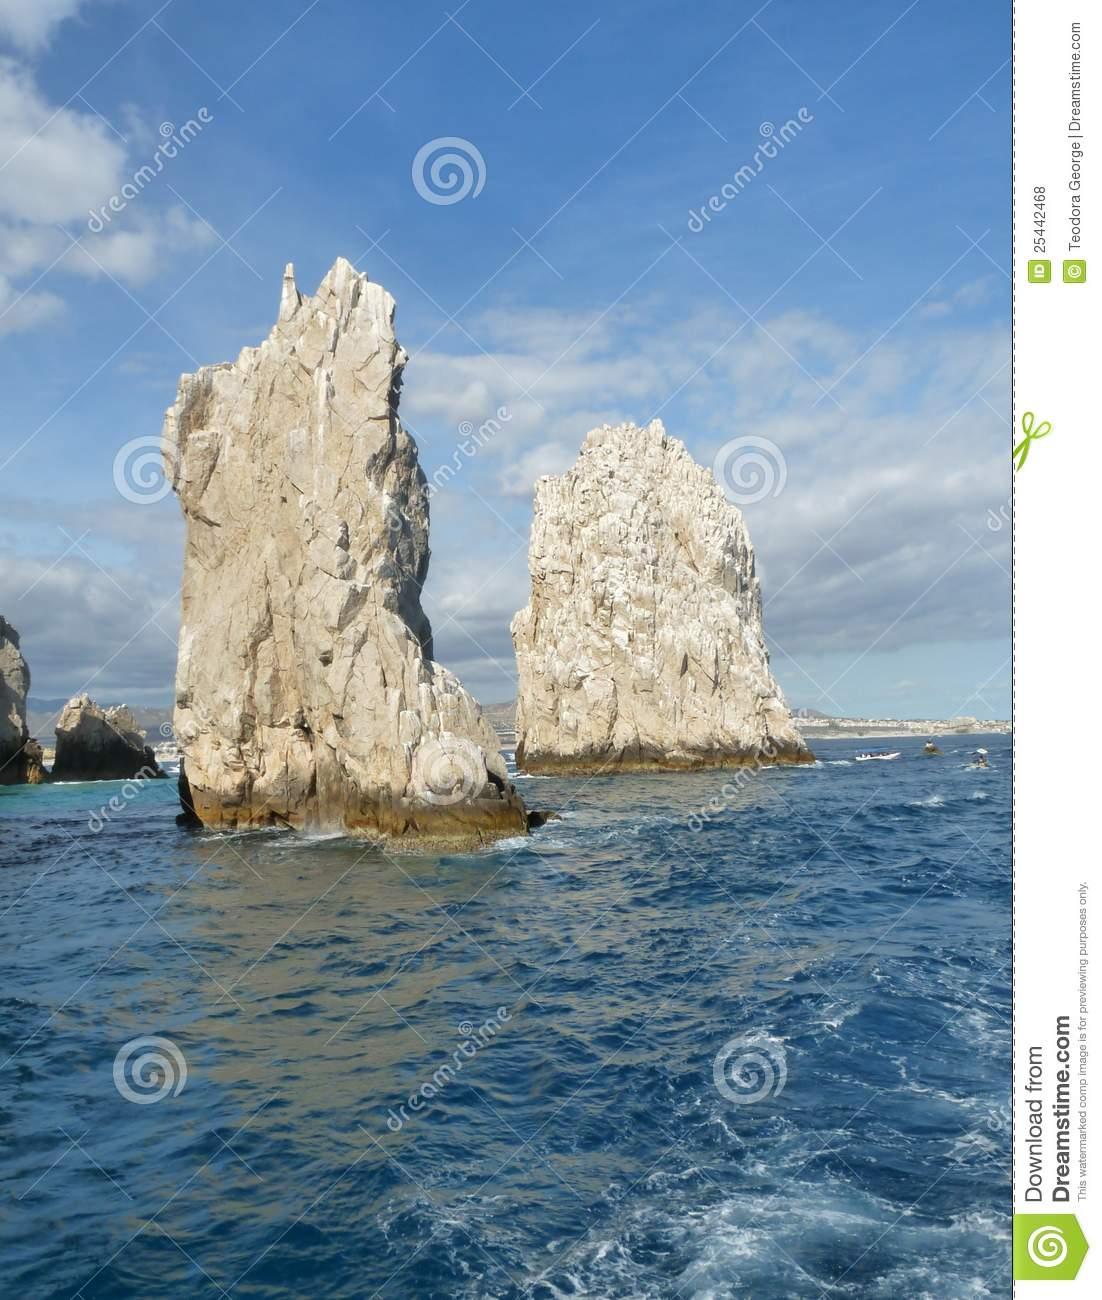 Giant Rocks Clipart.